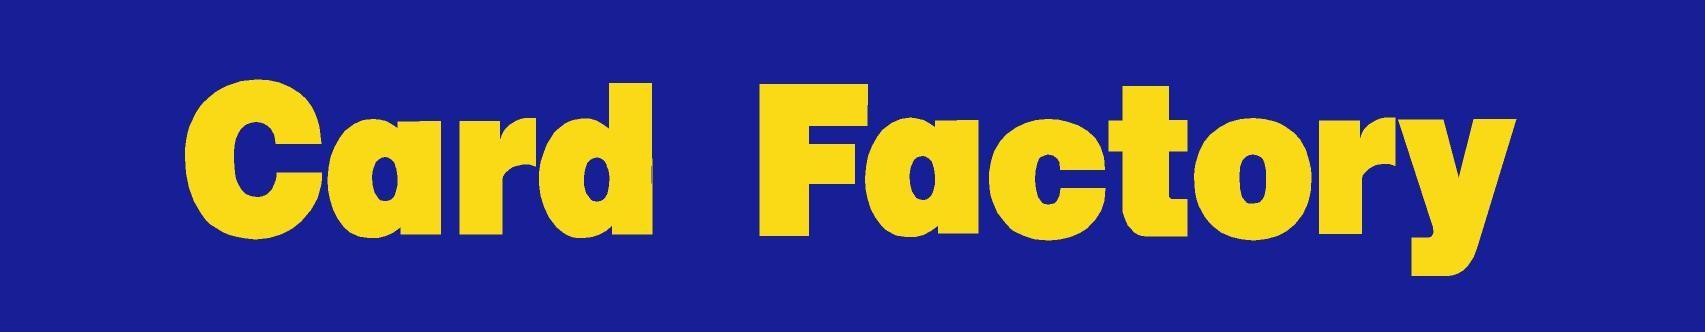 Card Factory PLC logo